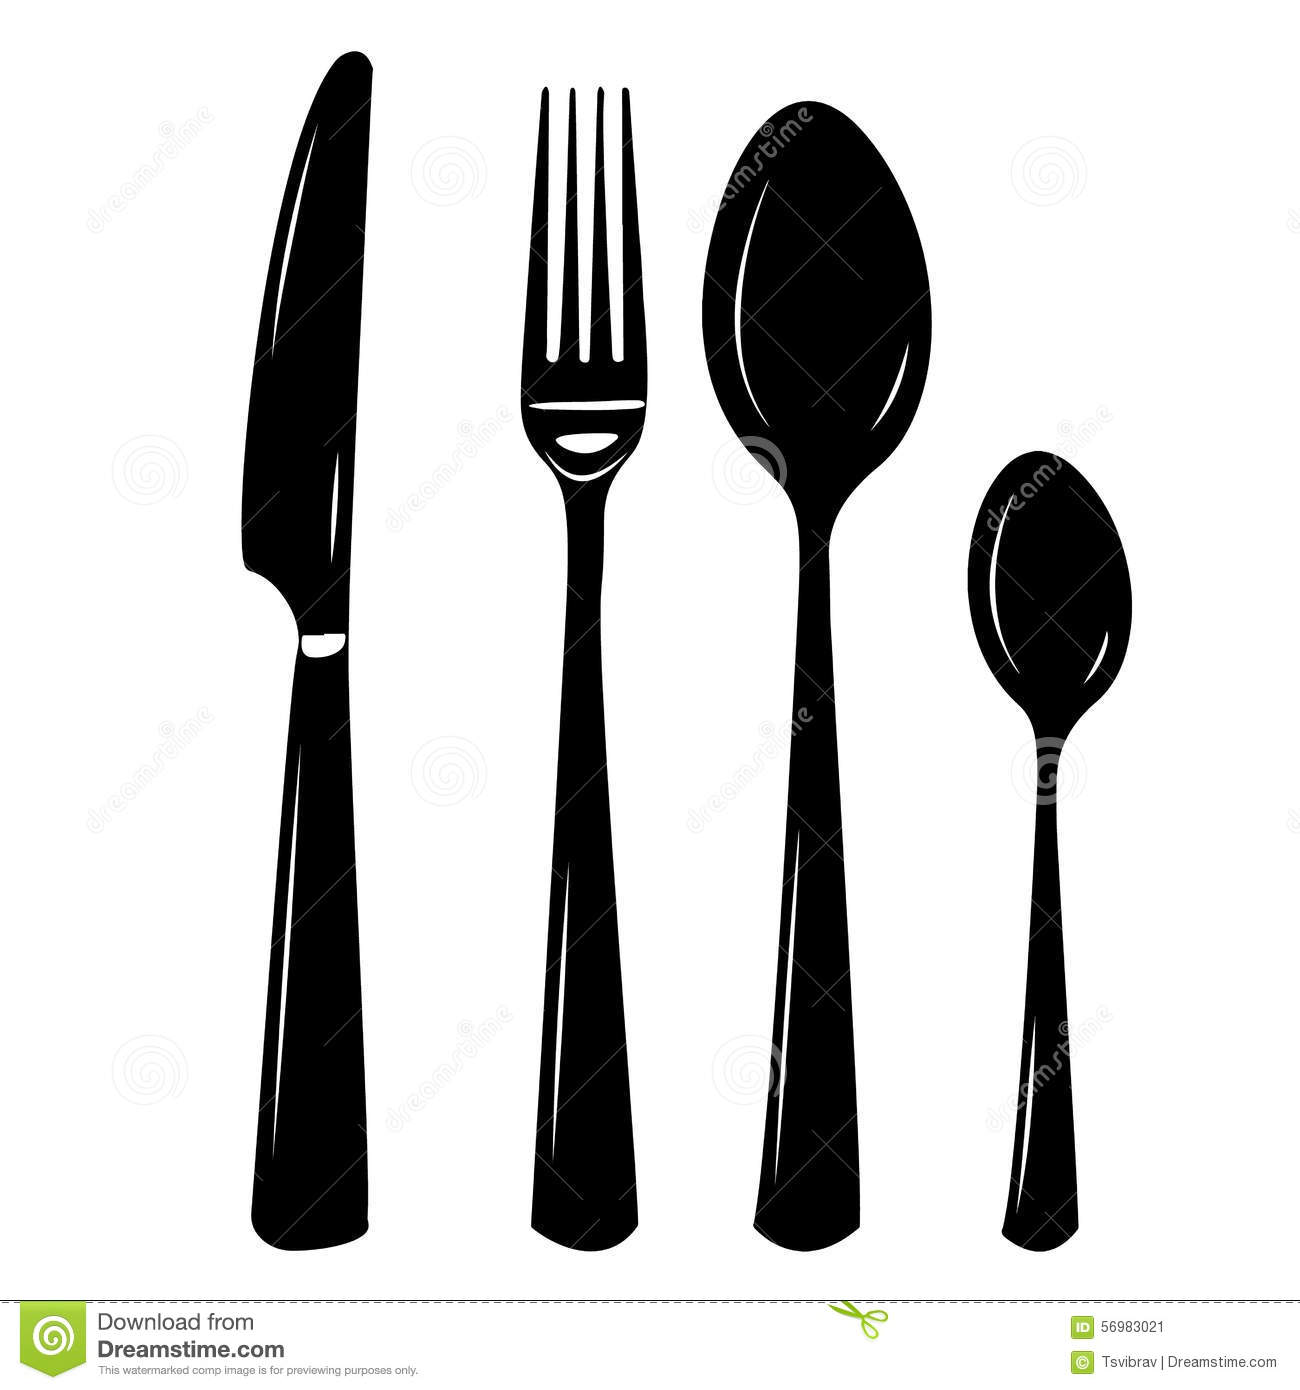 Cutlery Vector Illustration Of Knife, Spoon, Fork, Teaspoon Stock.